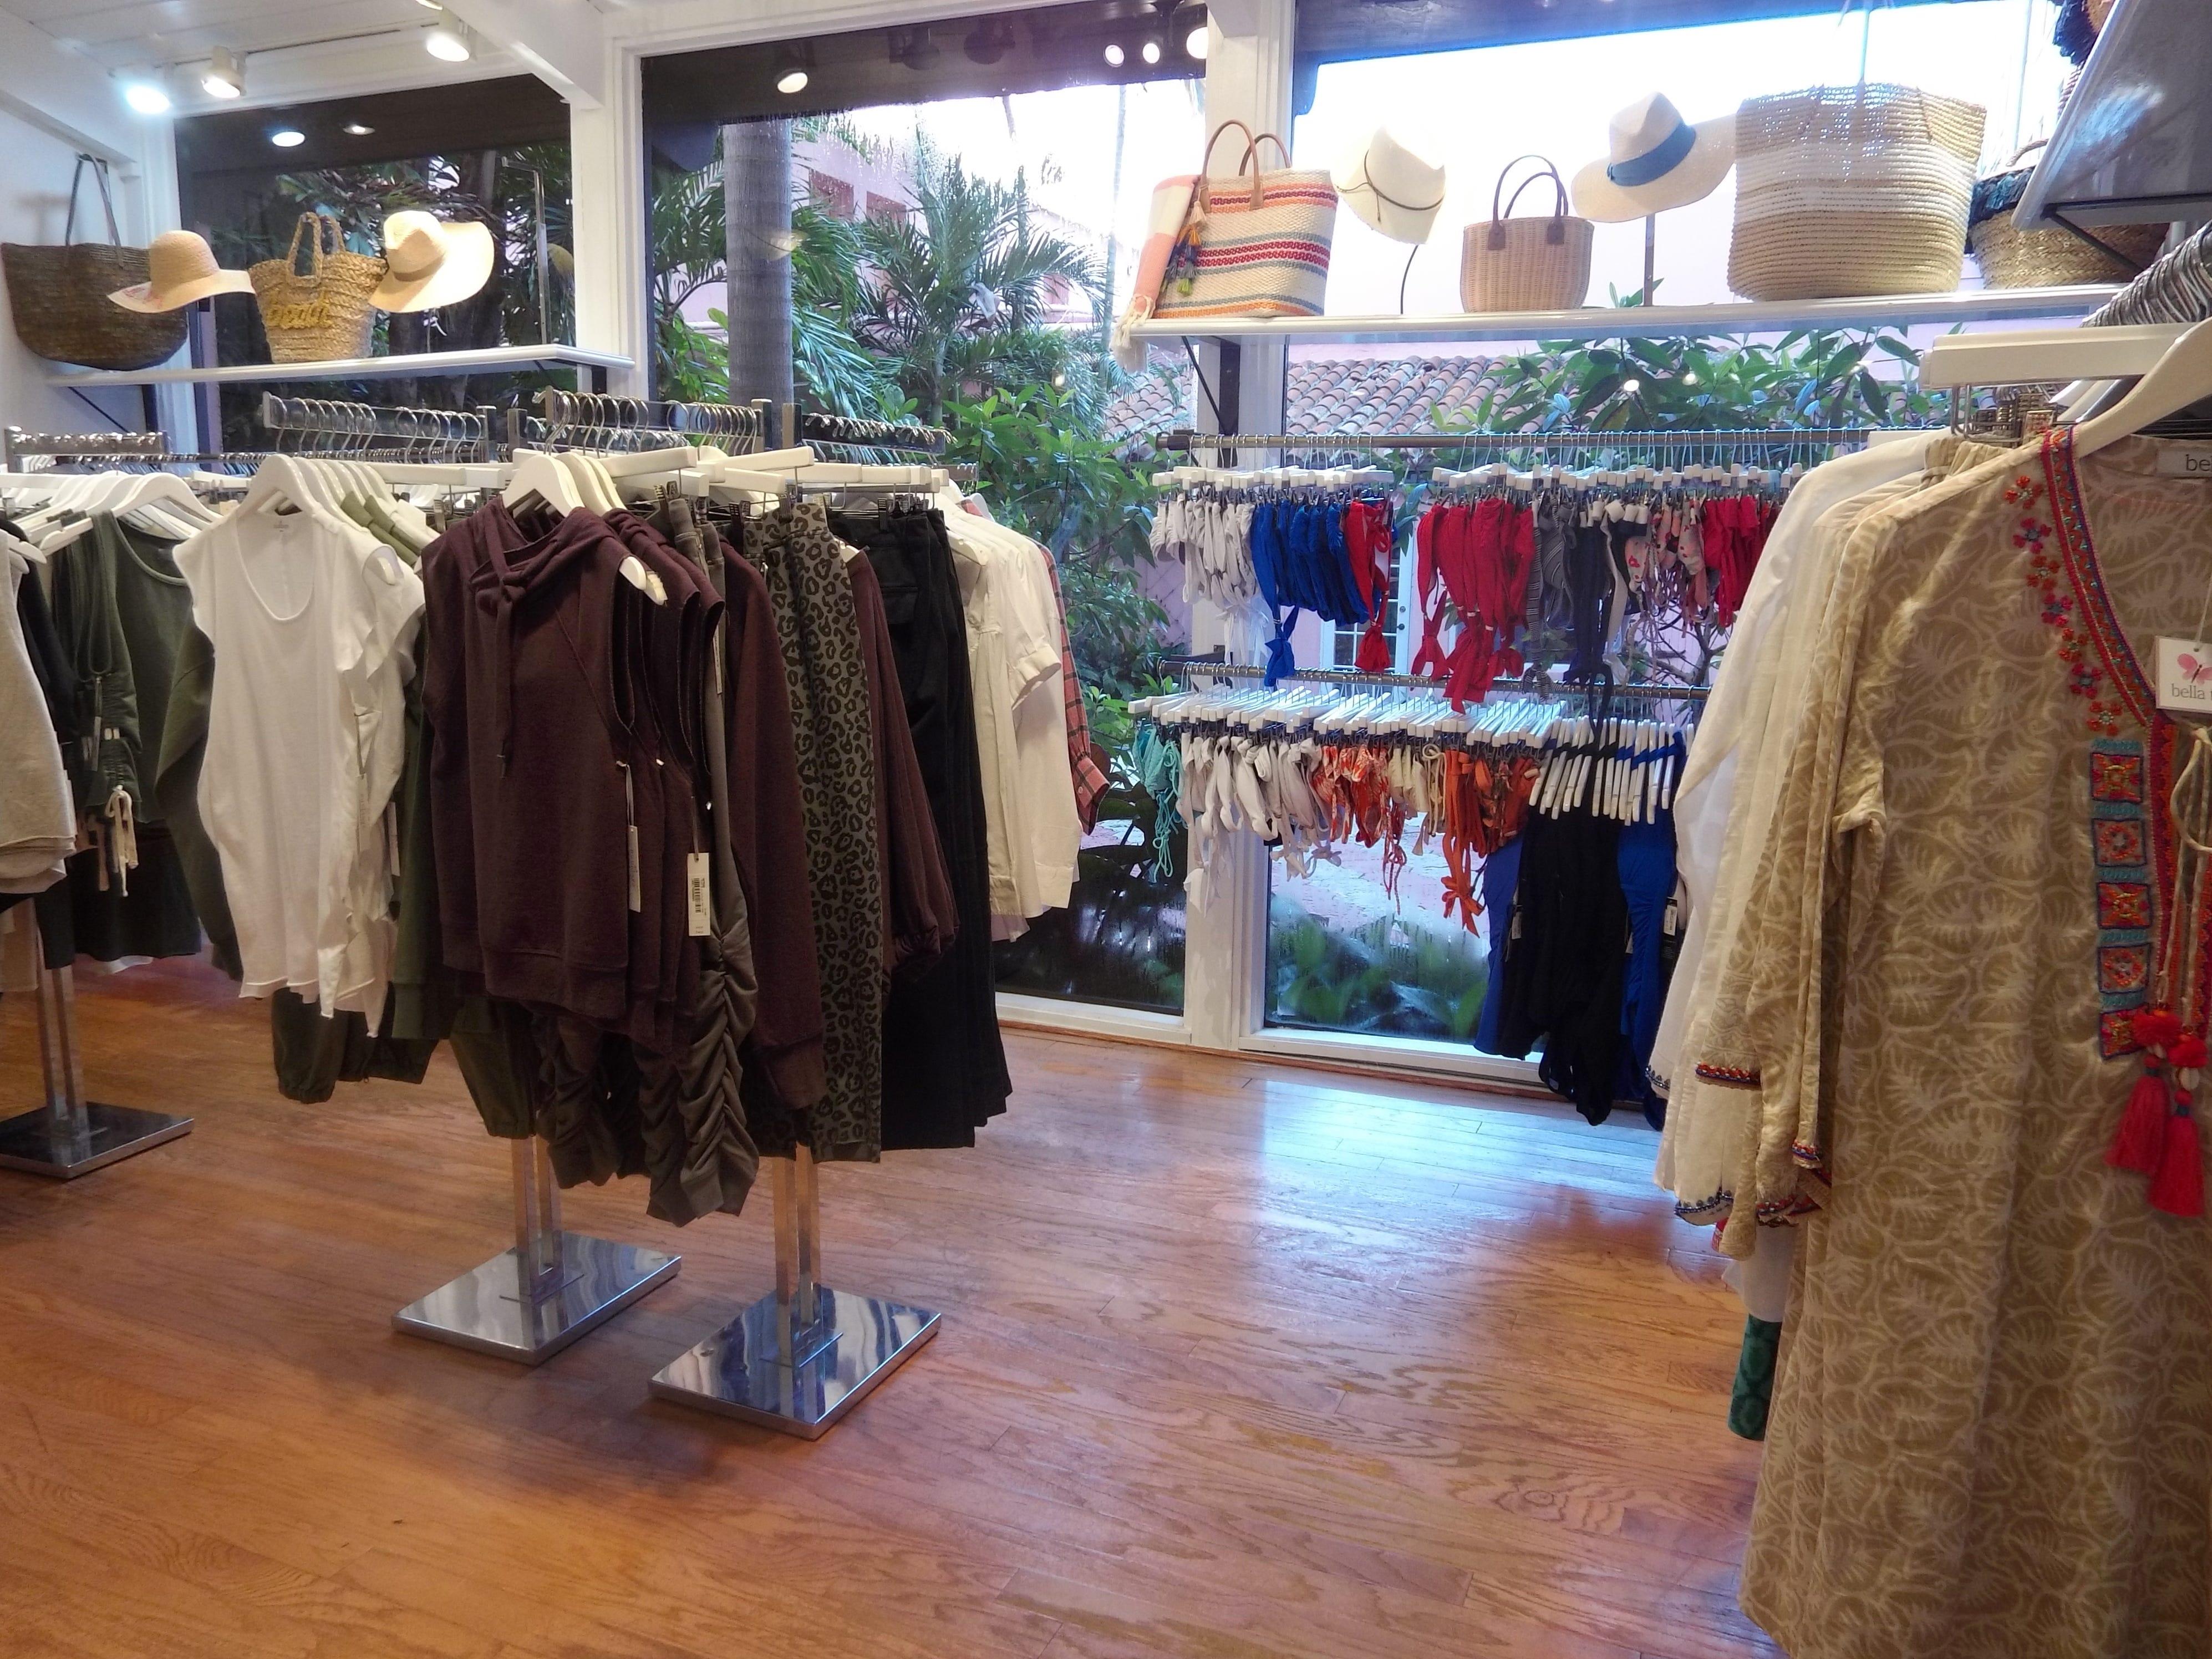 More warm-weather wear at Mizner's Resort Shop.